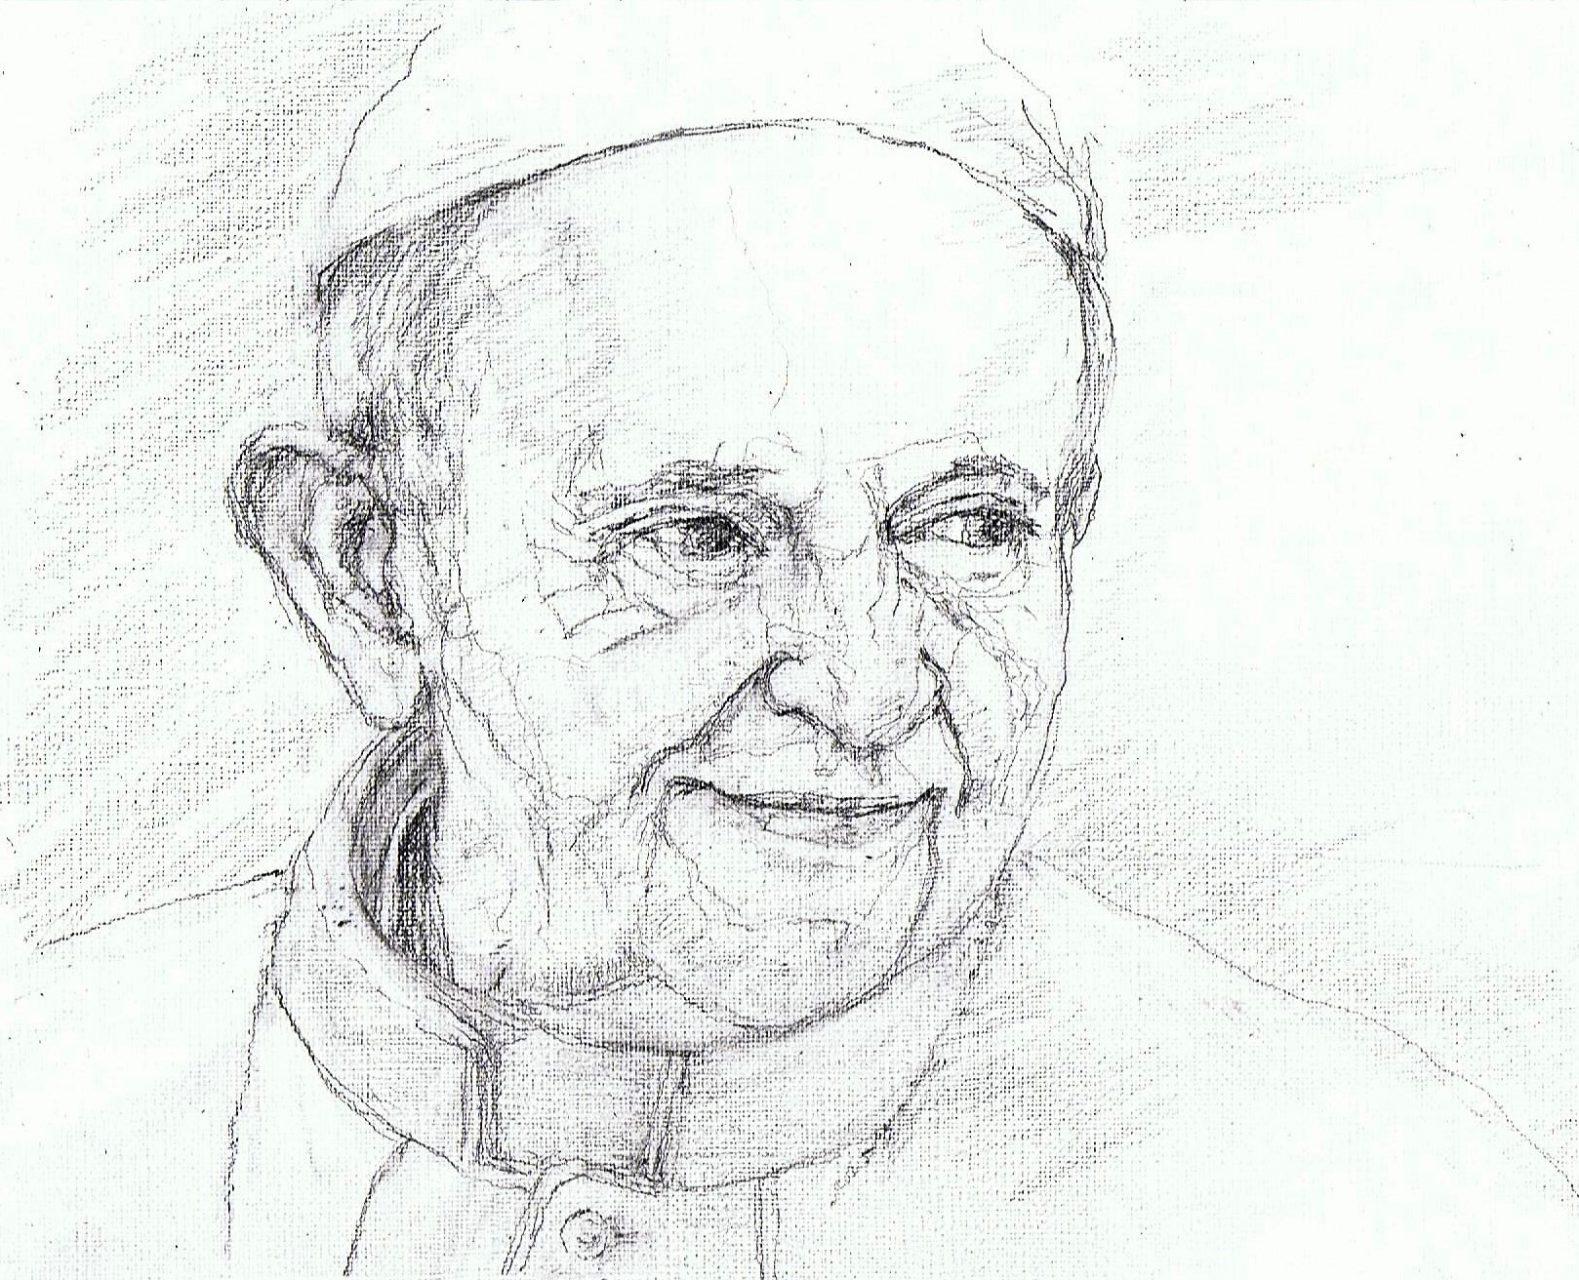 365 dagen een portret 23 Paus Franciscus Potlood 2B 19c25